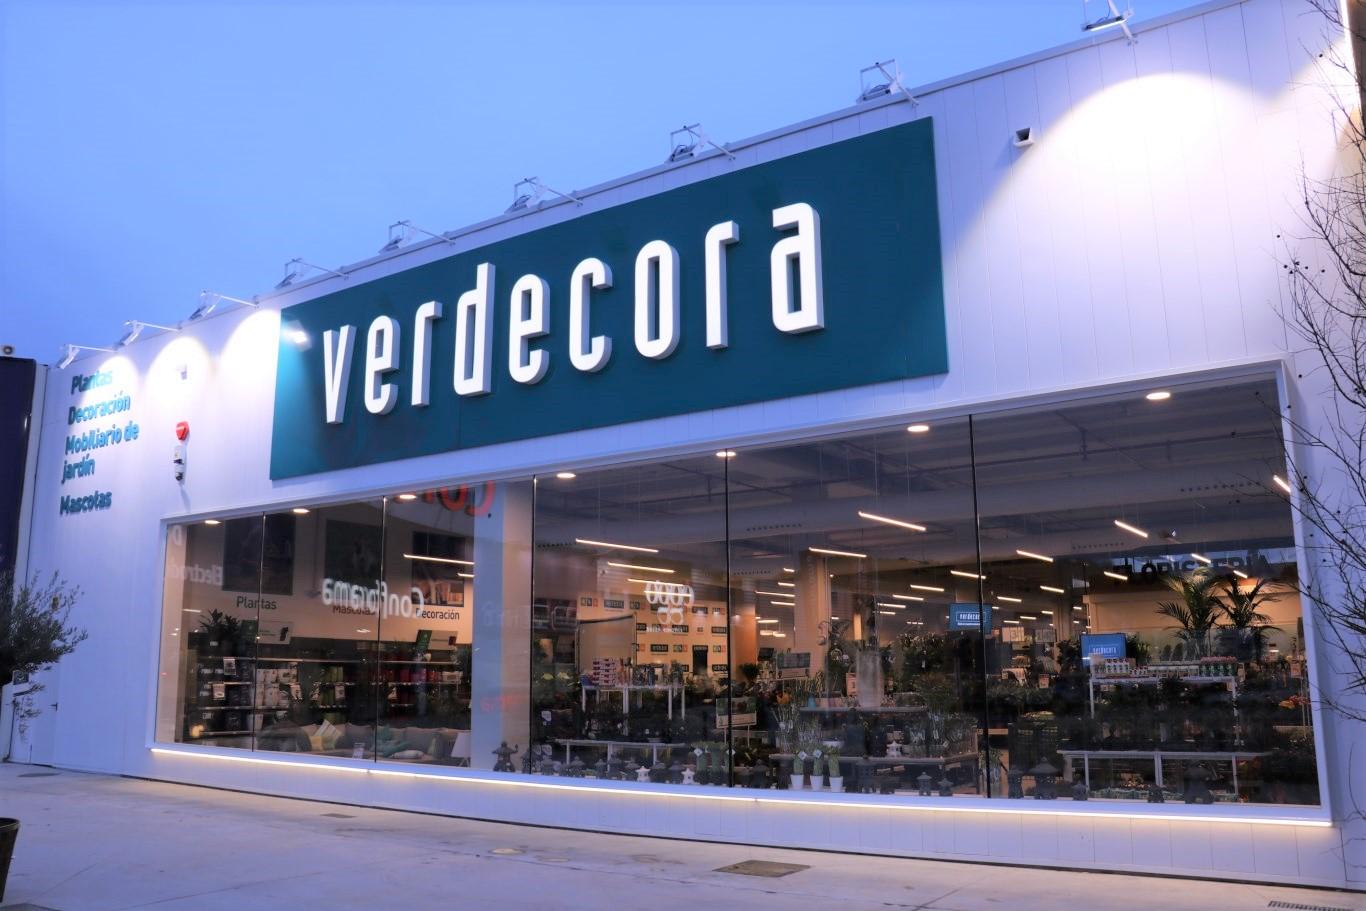 Verdecora alcal de henares abre sus puertas dream alcal for Verdecora madrid